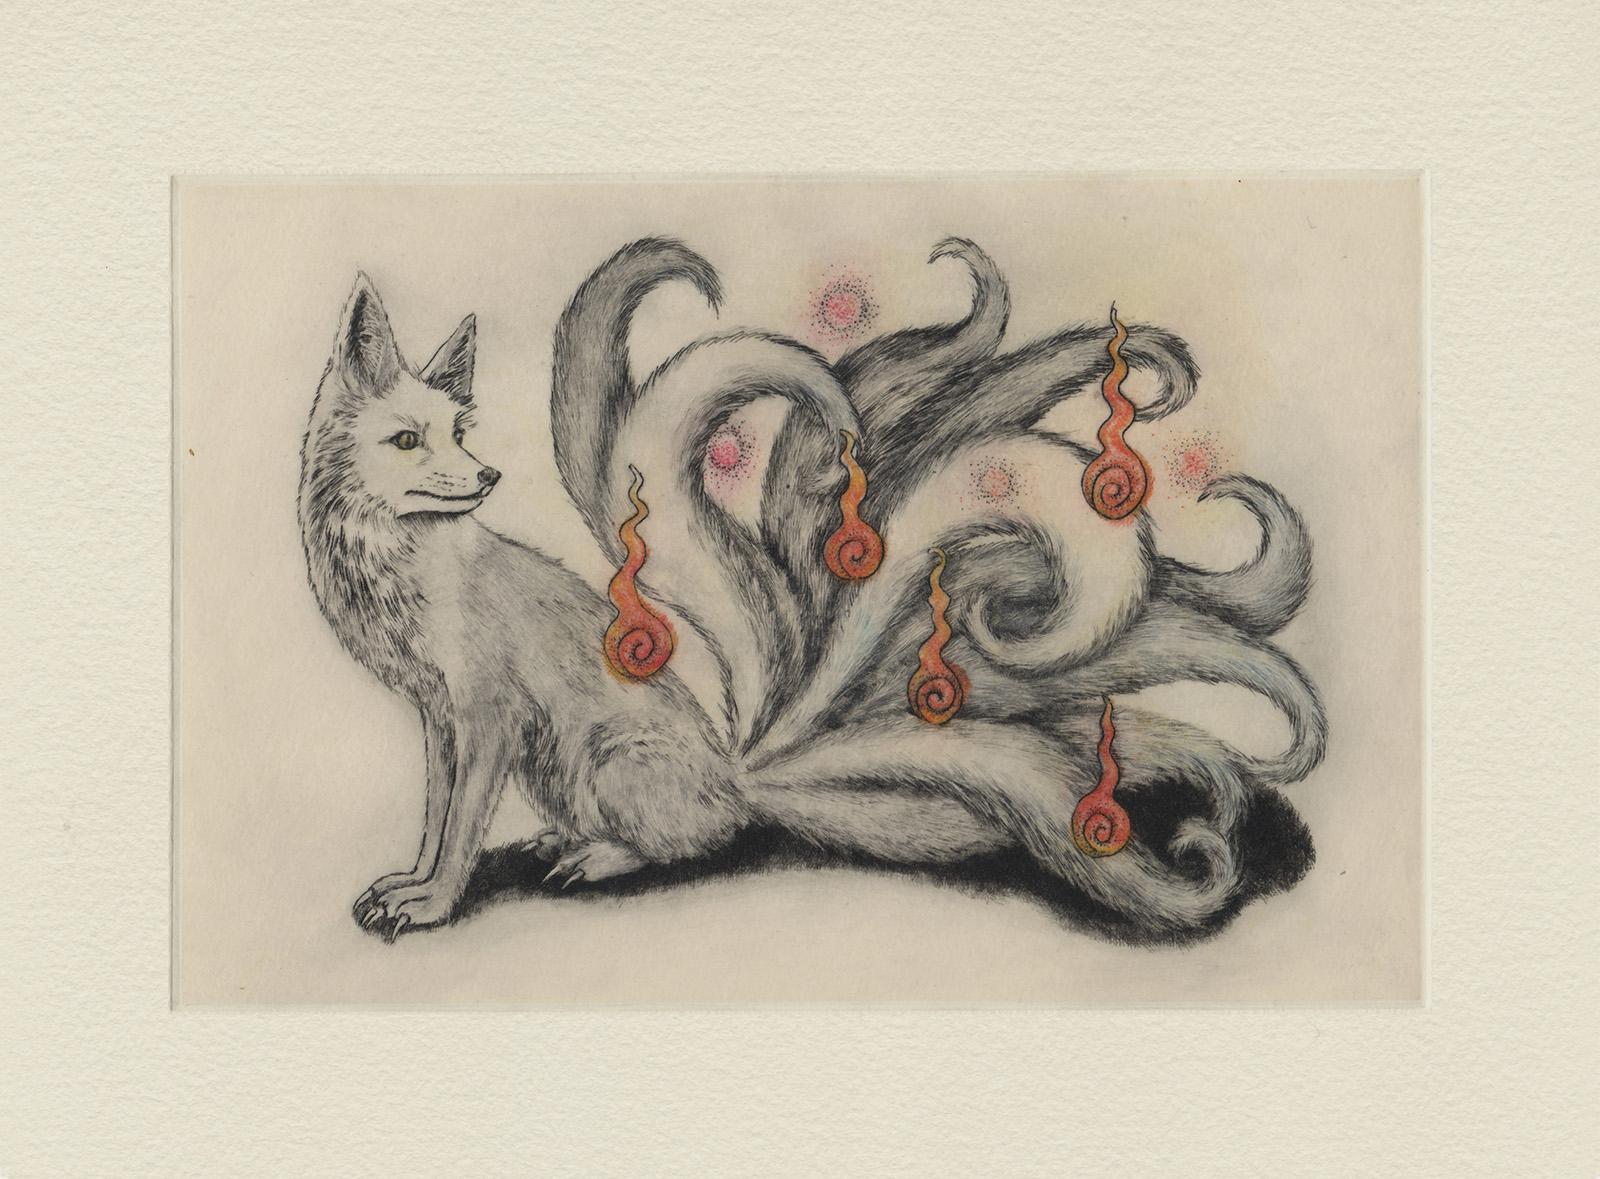 Nine-Tailed Fox (drypoint etching by Yaemi Shigyo)